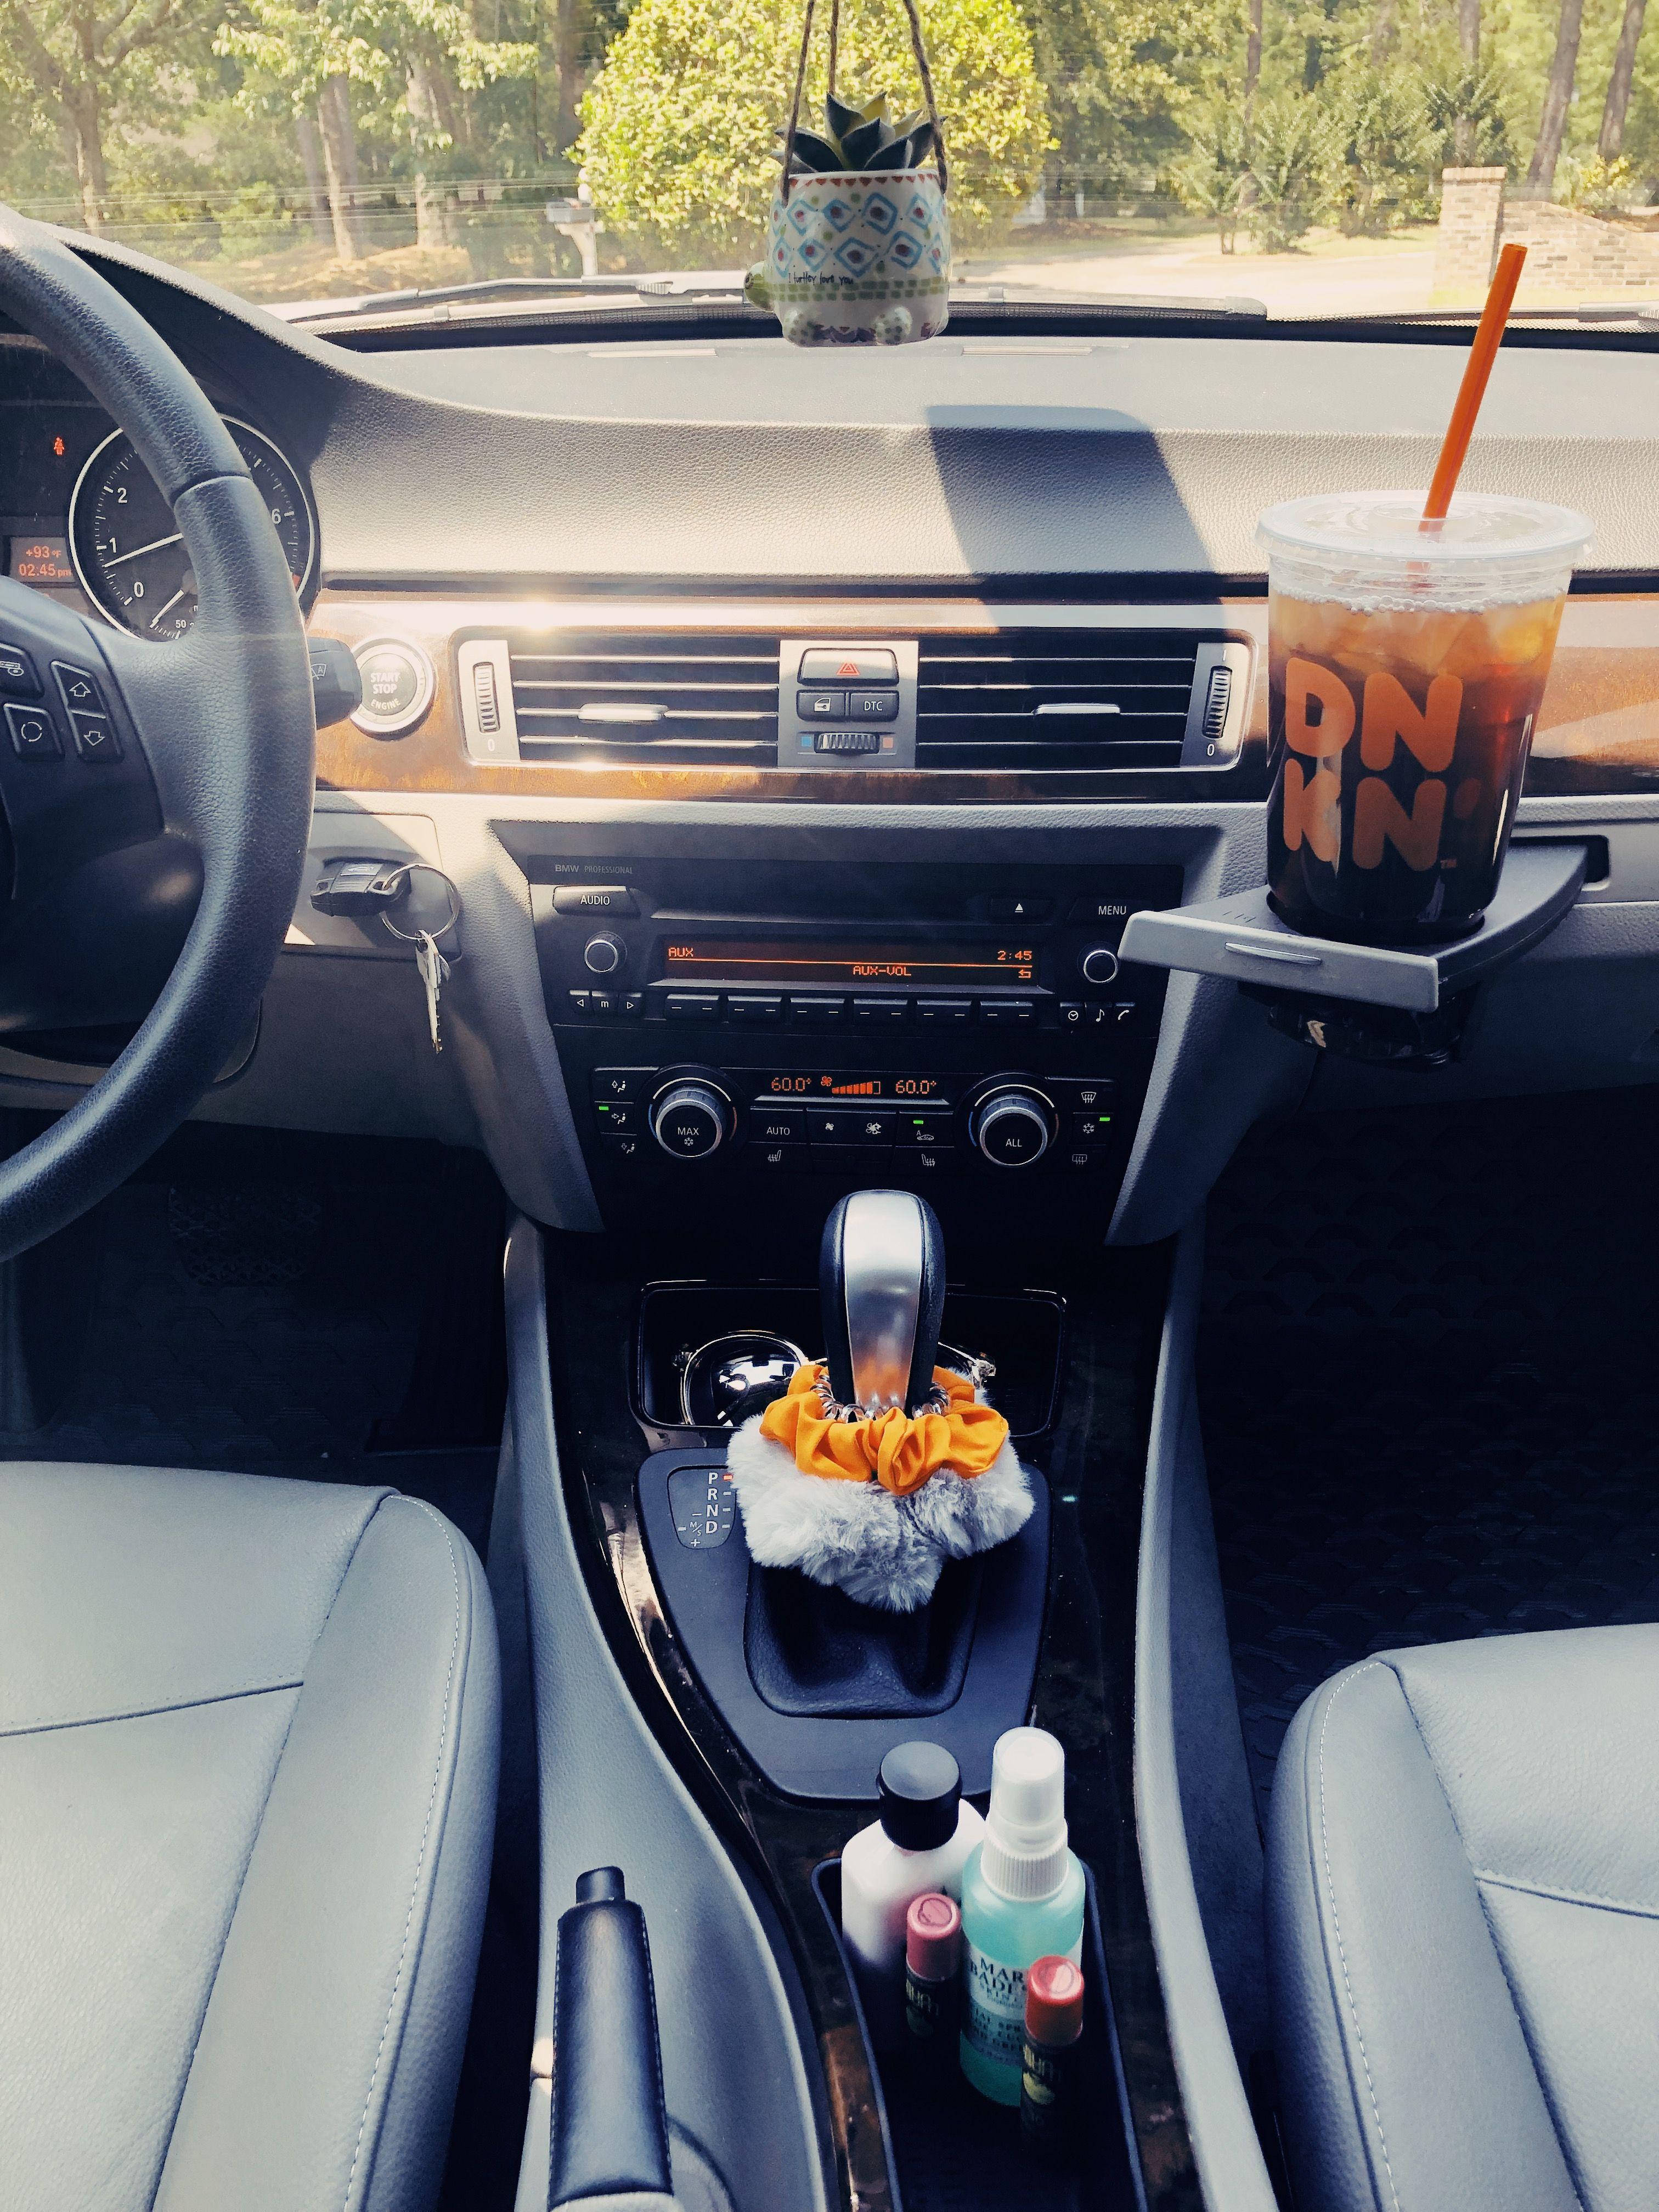 Car Aesthetic Preppy Car Dream Cars Jeep Cute Car Accessories